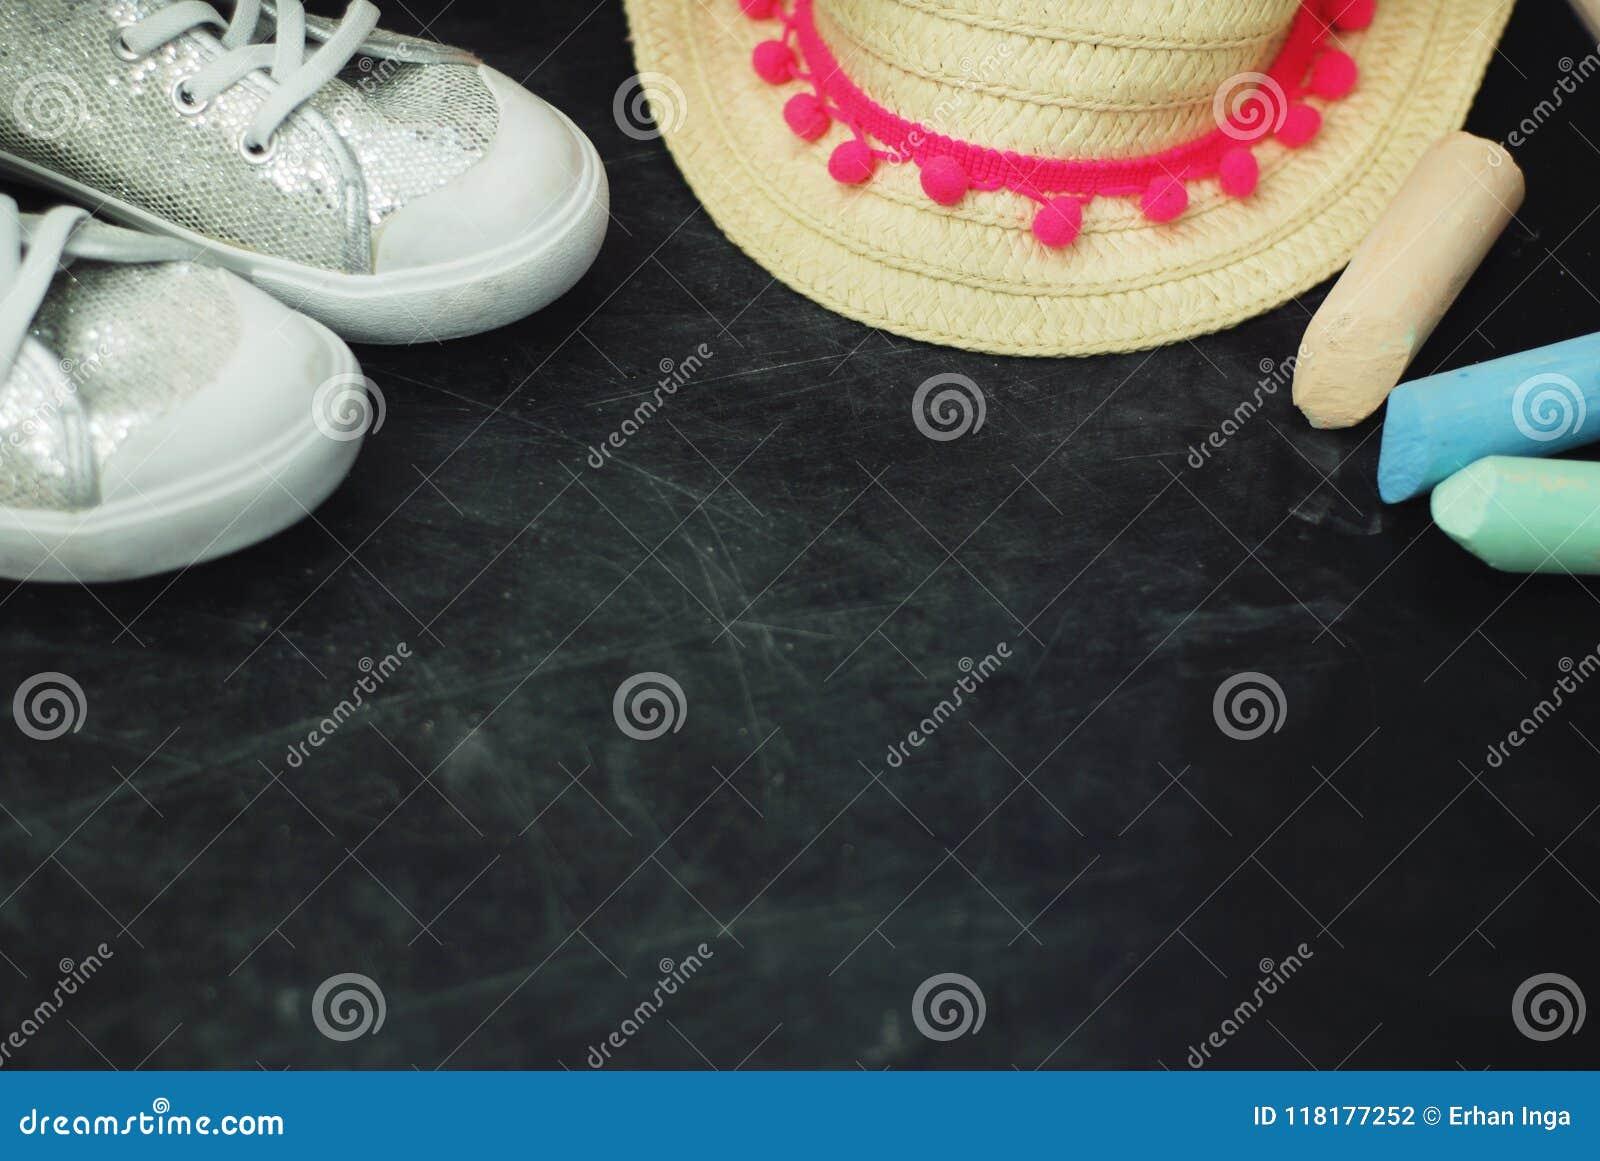 Sport Boots Children Chalkcs Chalkboard Textured Background Copy Space. Education family Parents